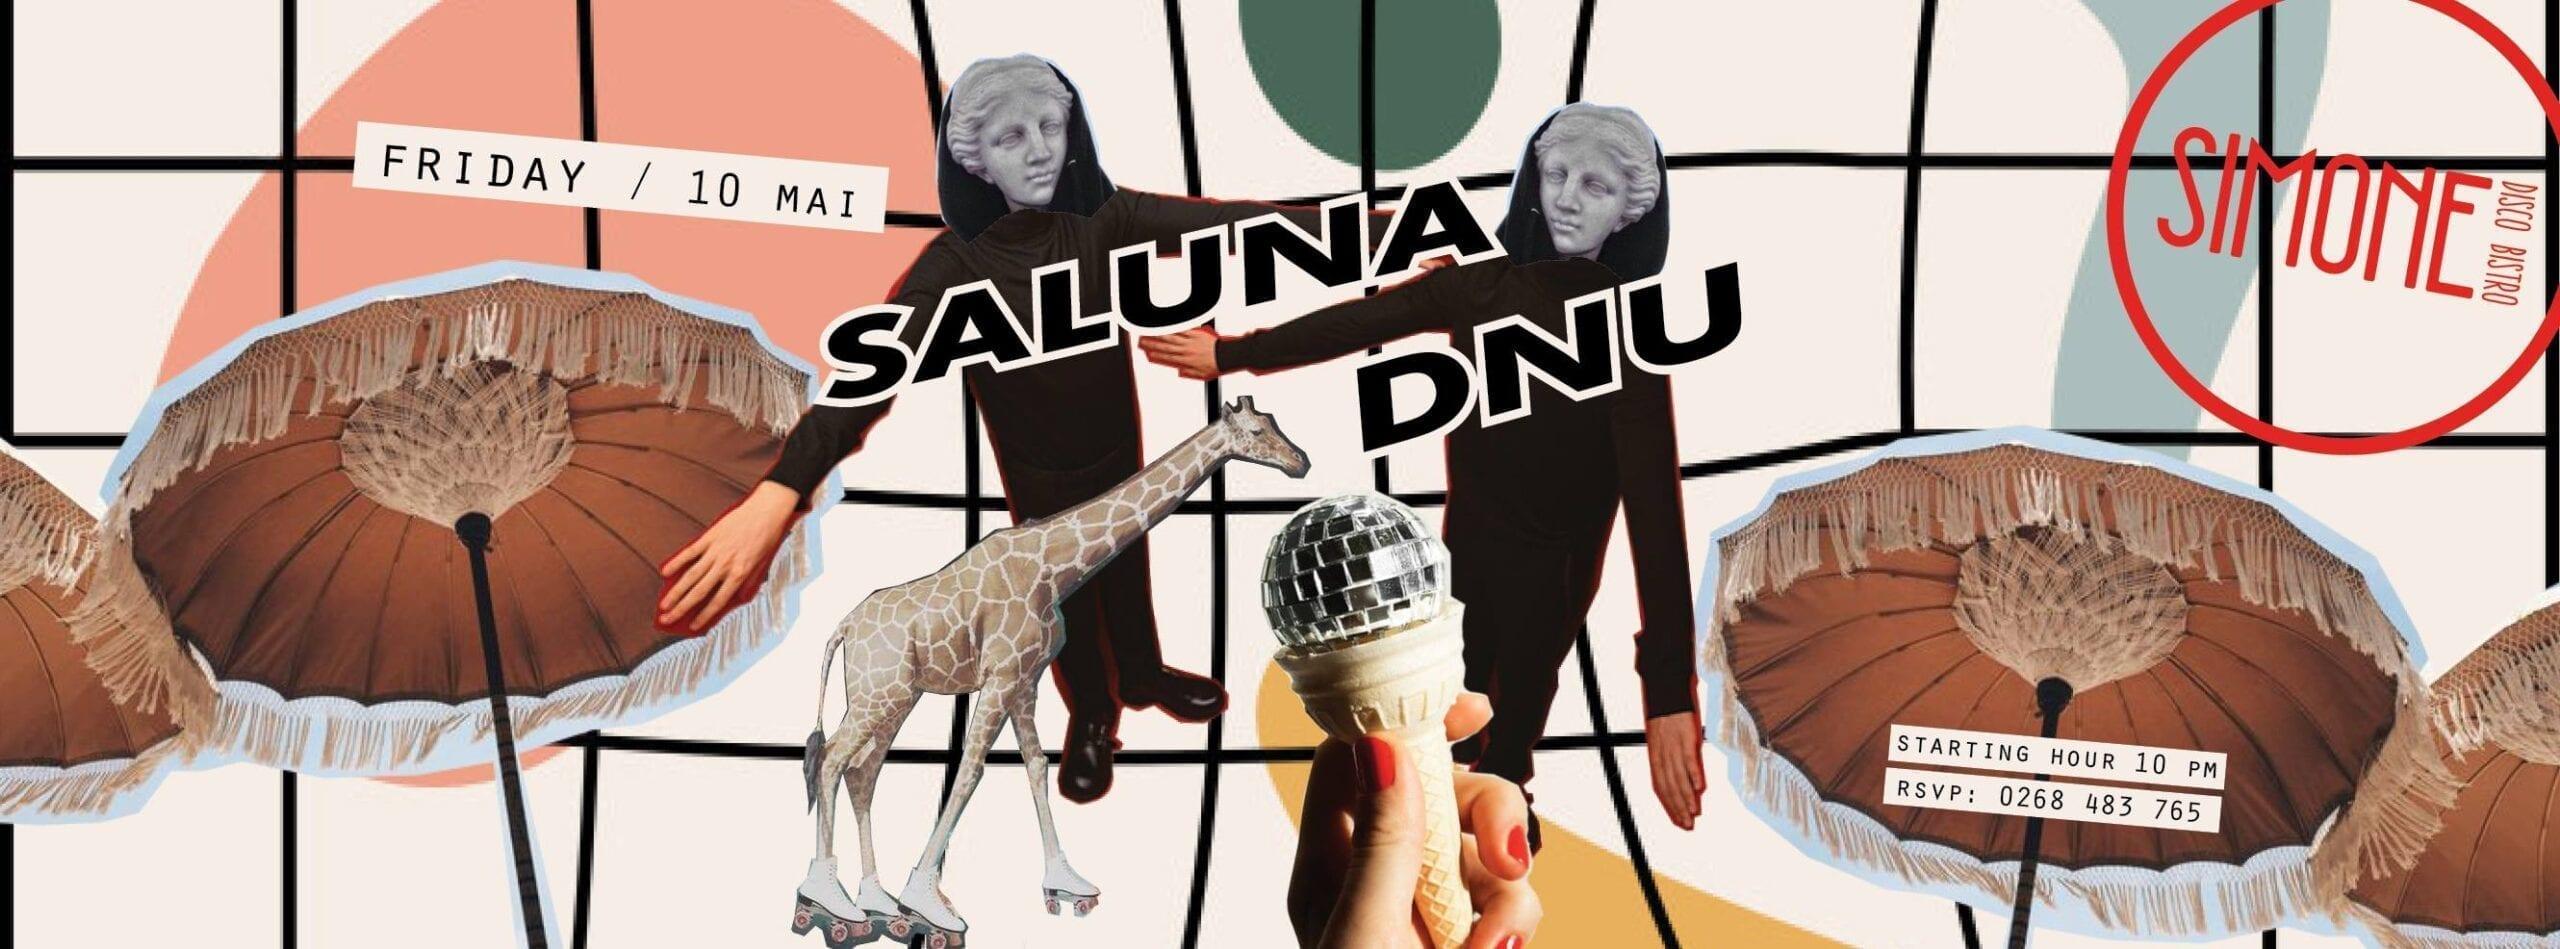 Saluna [B] & DNU - Simone Brașov